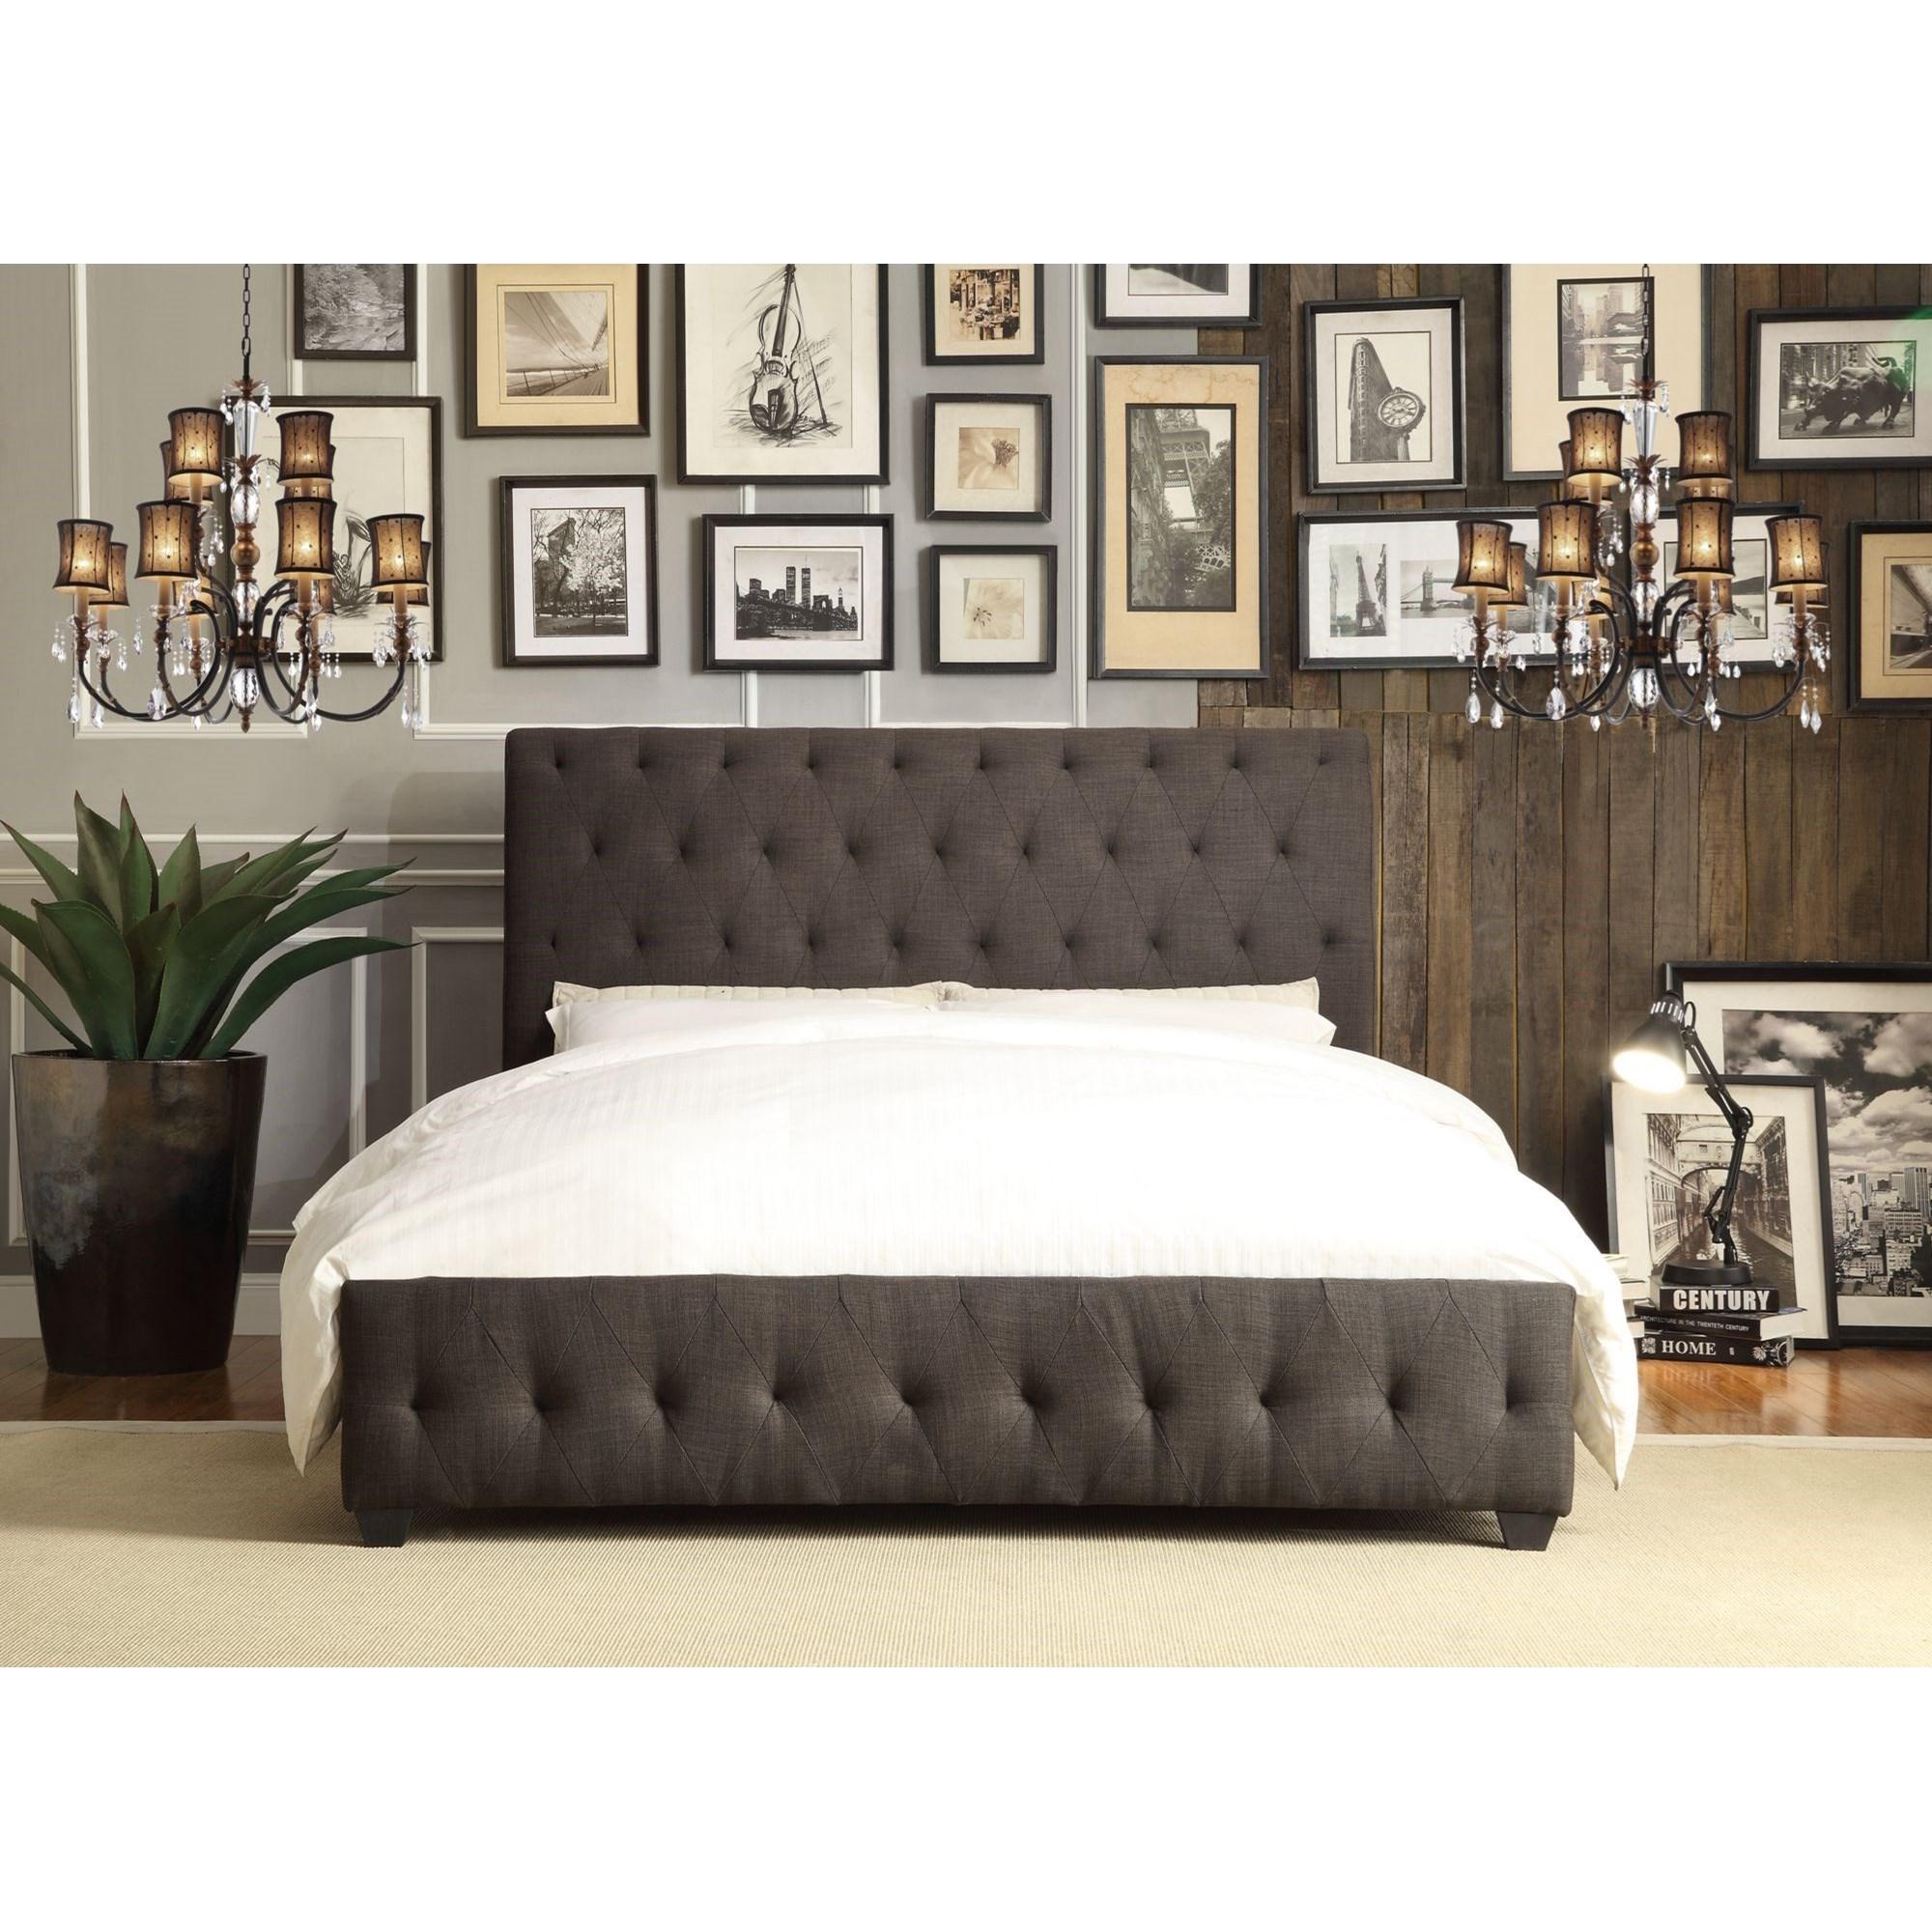 Homelegance Baldwyn Contemporary Queen Upholstered Platform Bed With Tufting Darvin Furniture